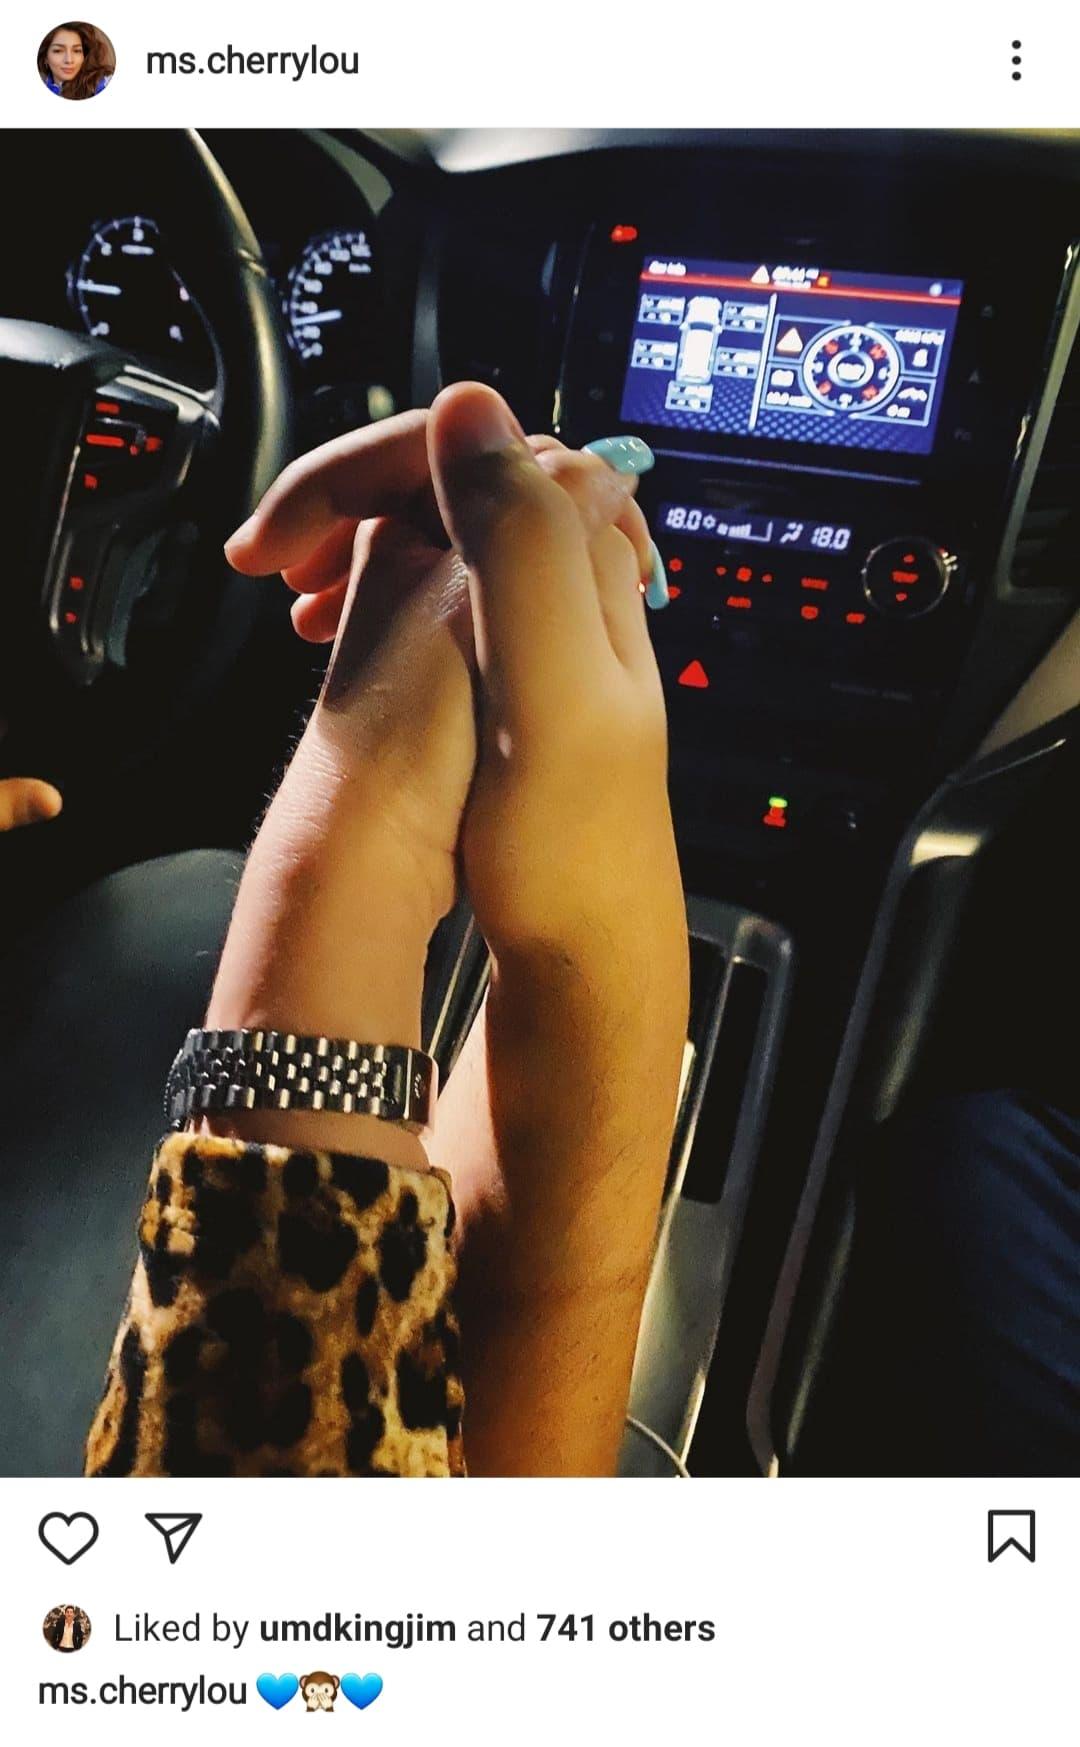 instagram photo: cherry lou and phytos ramirez holding hands